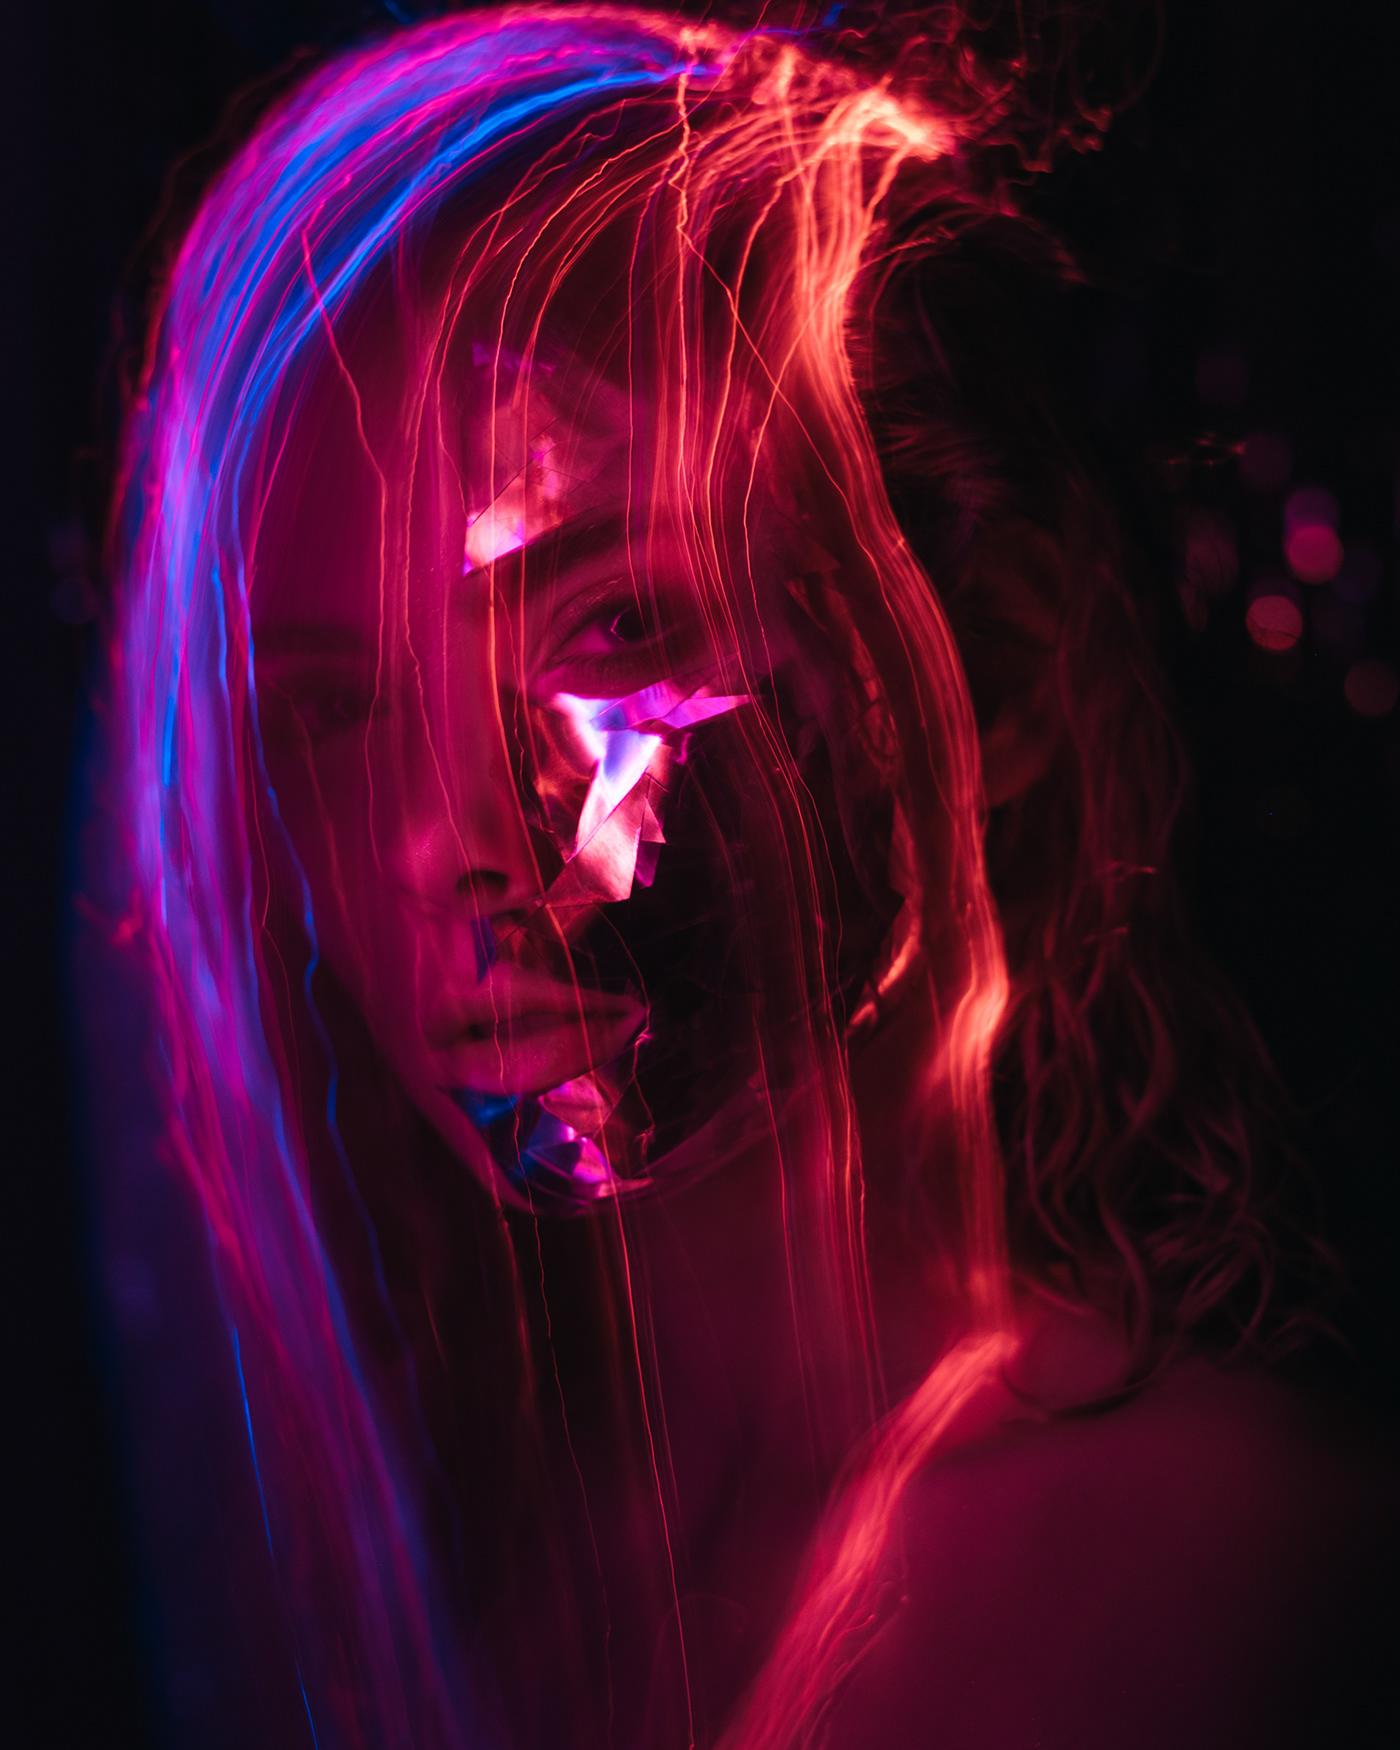 beauty beauty editorial beauty photography color light creative Fashion  neon portrait